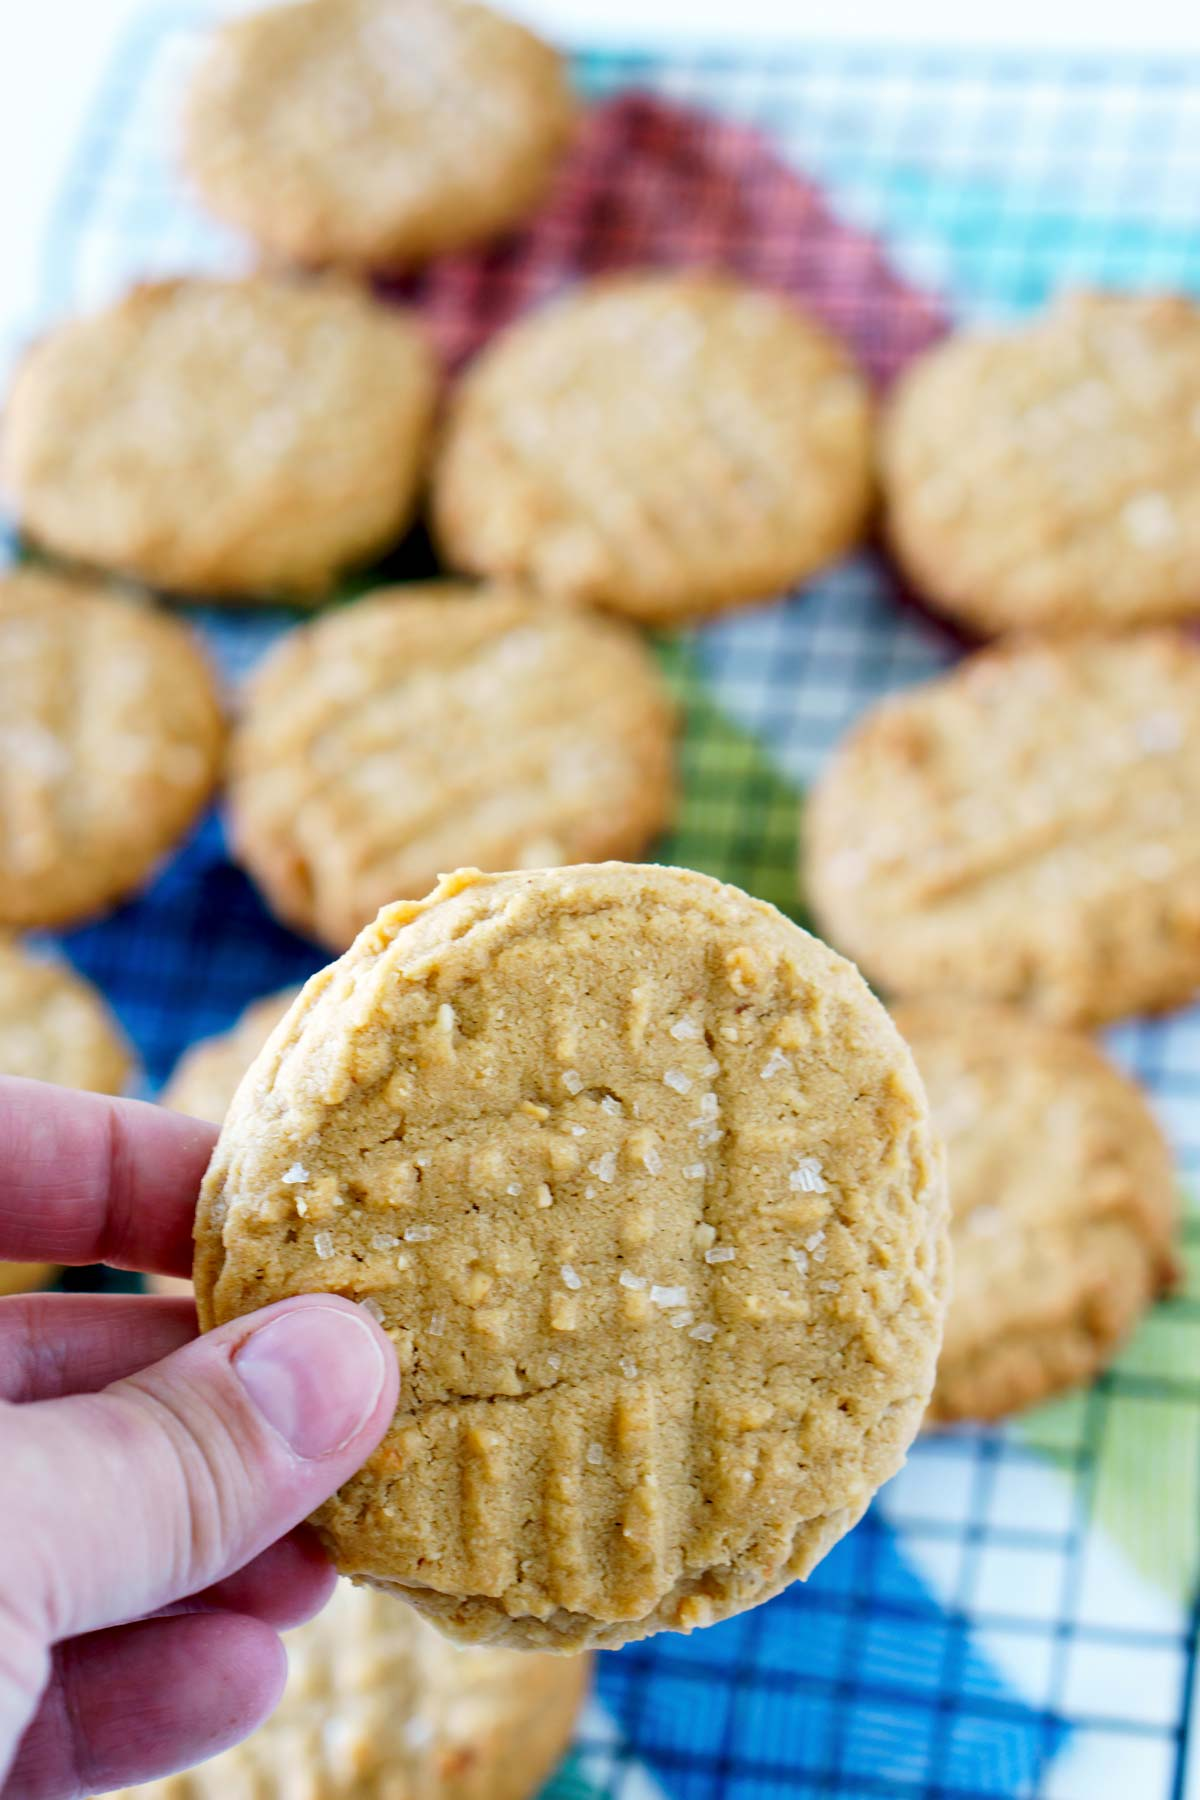 Best Peanut Butter Cookies that's